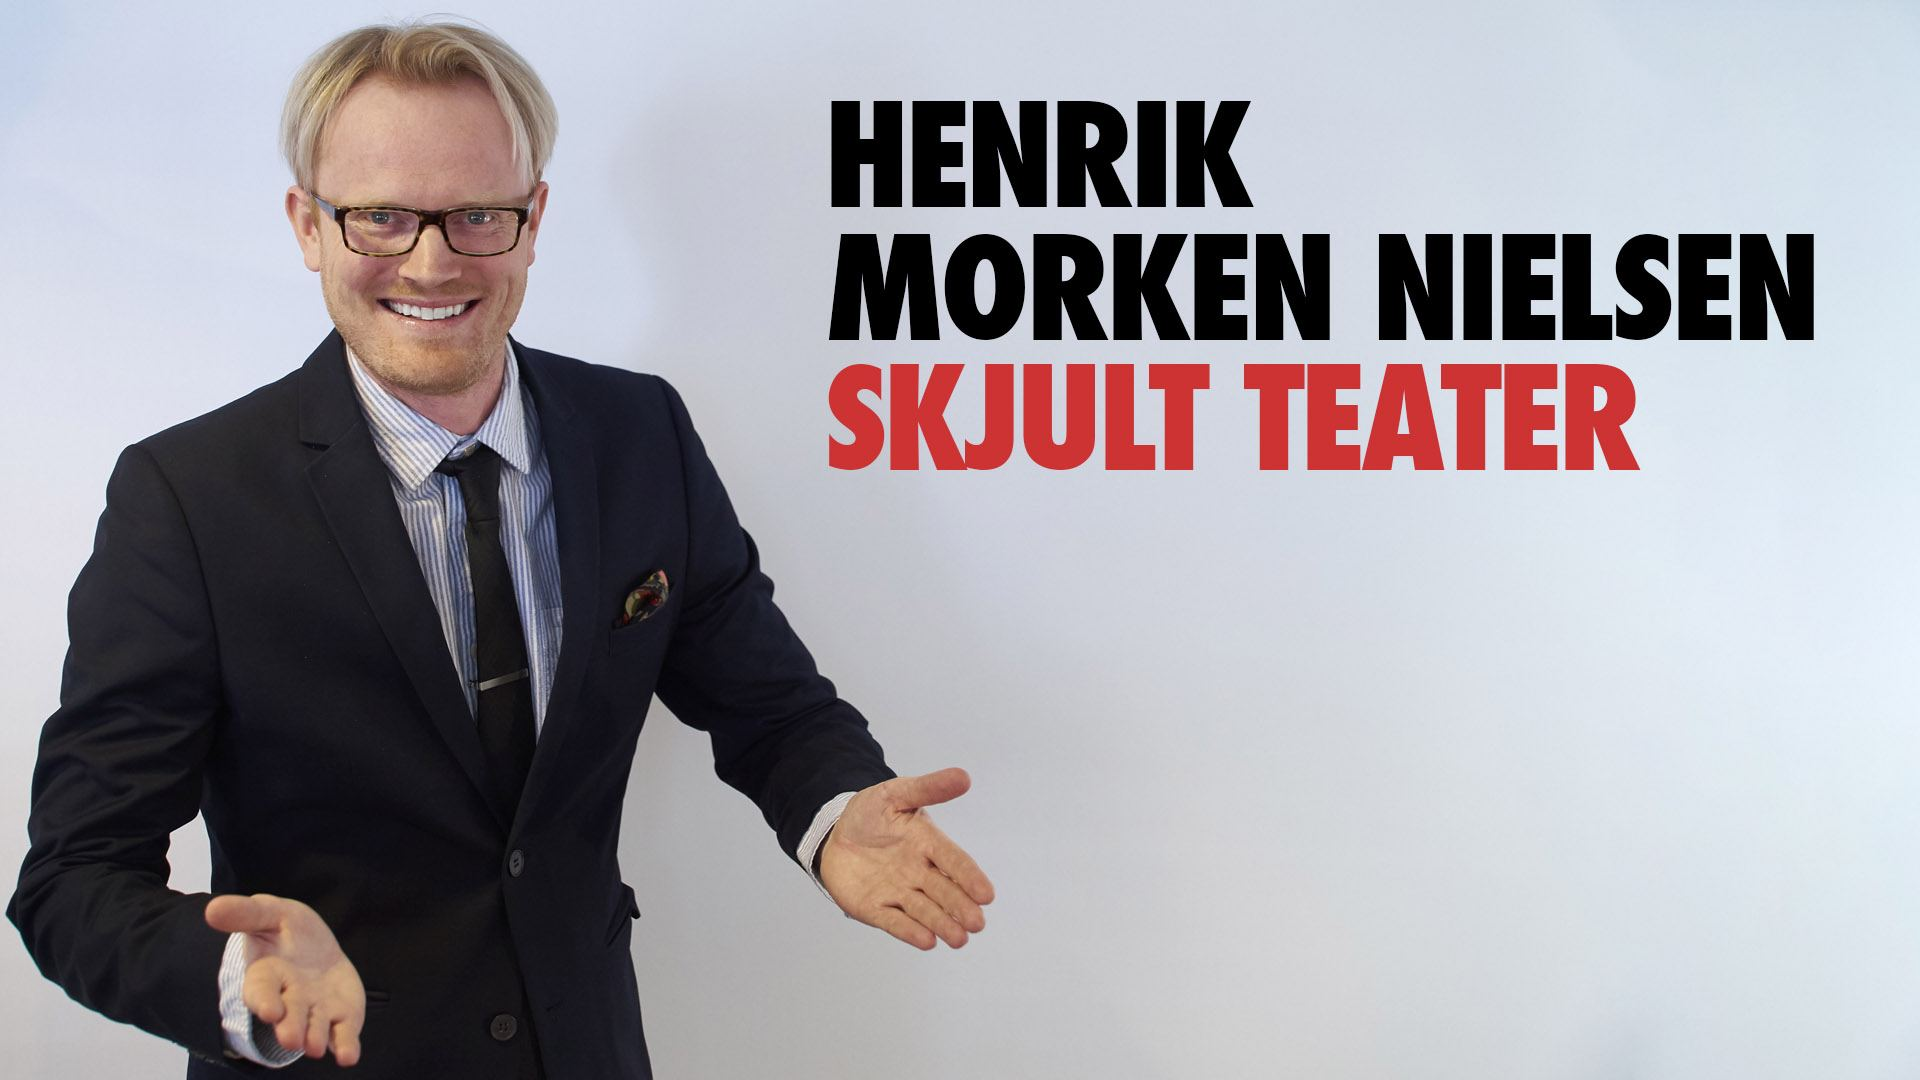 Henrik Morken Nielsen